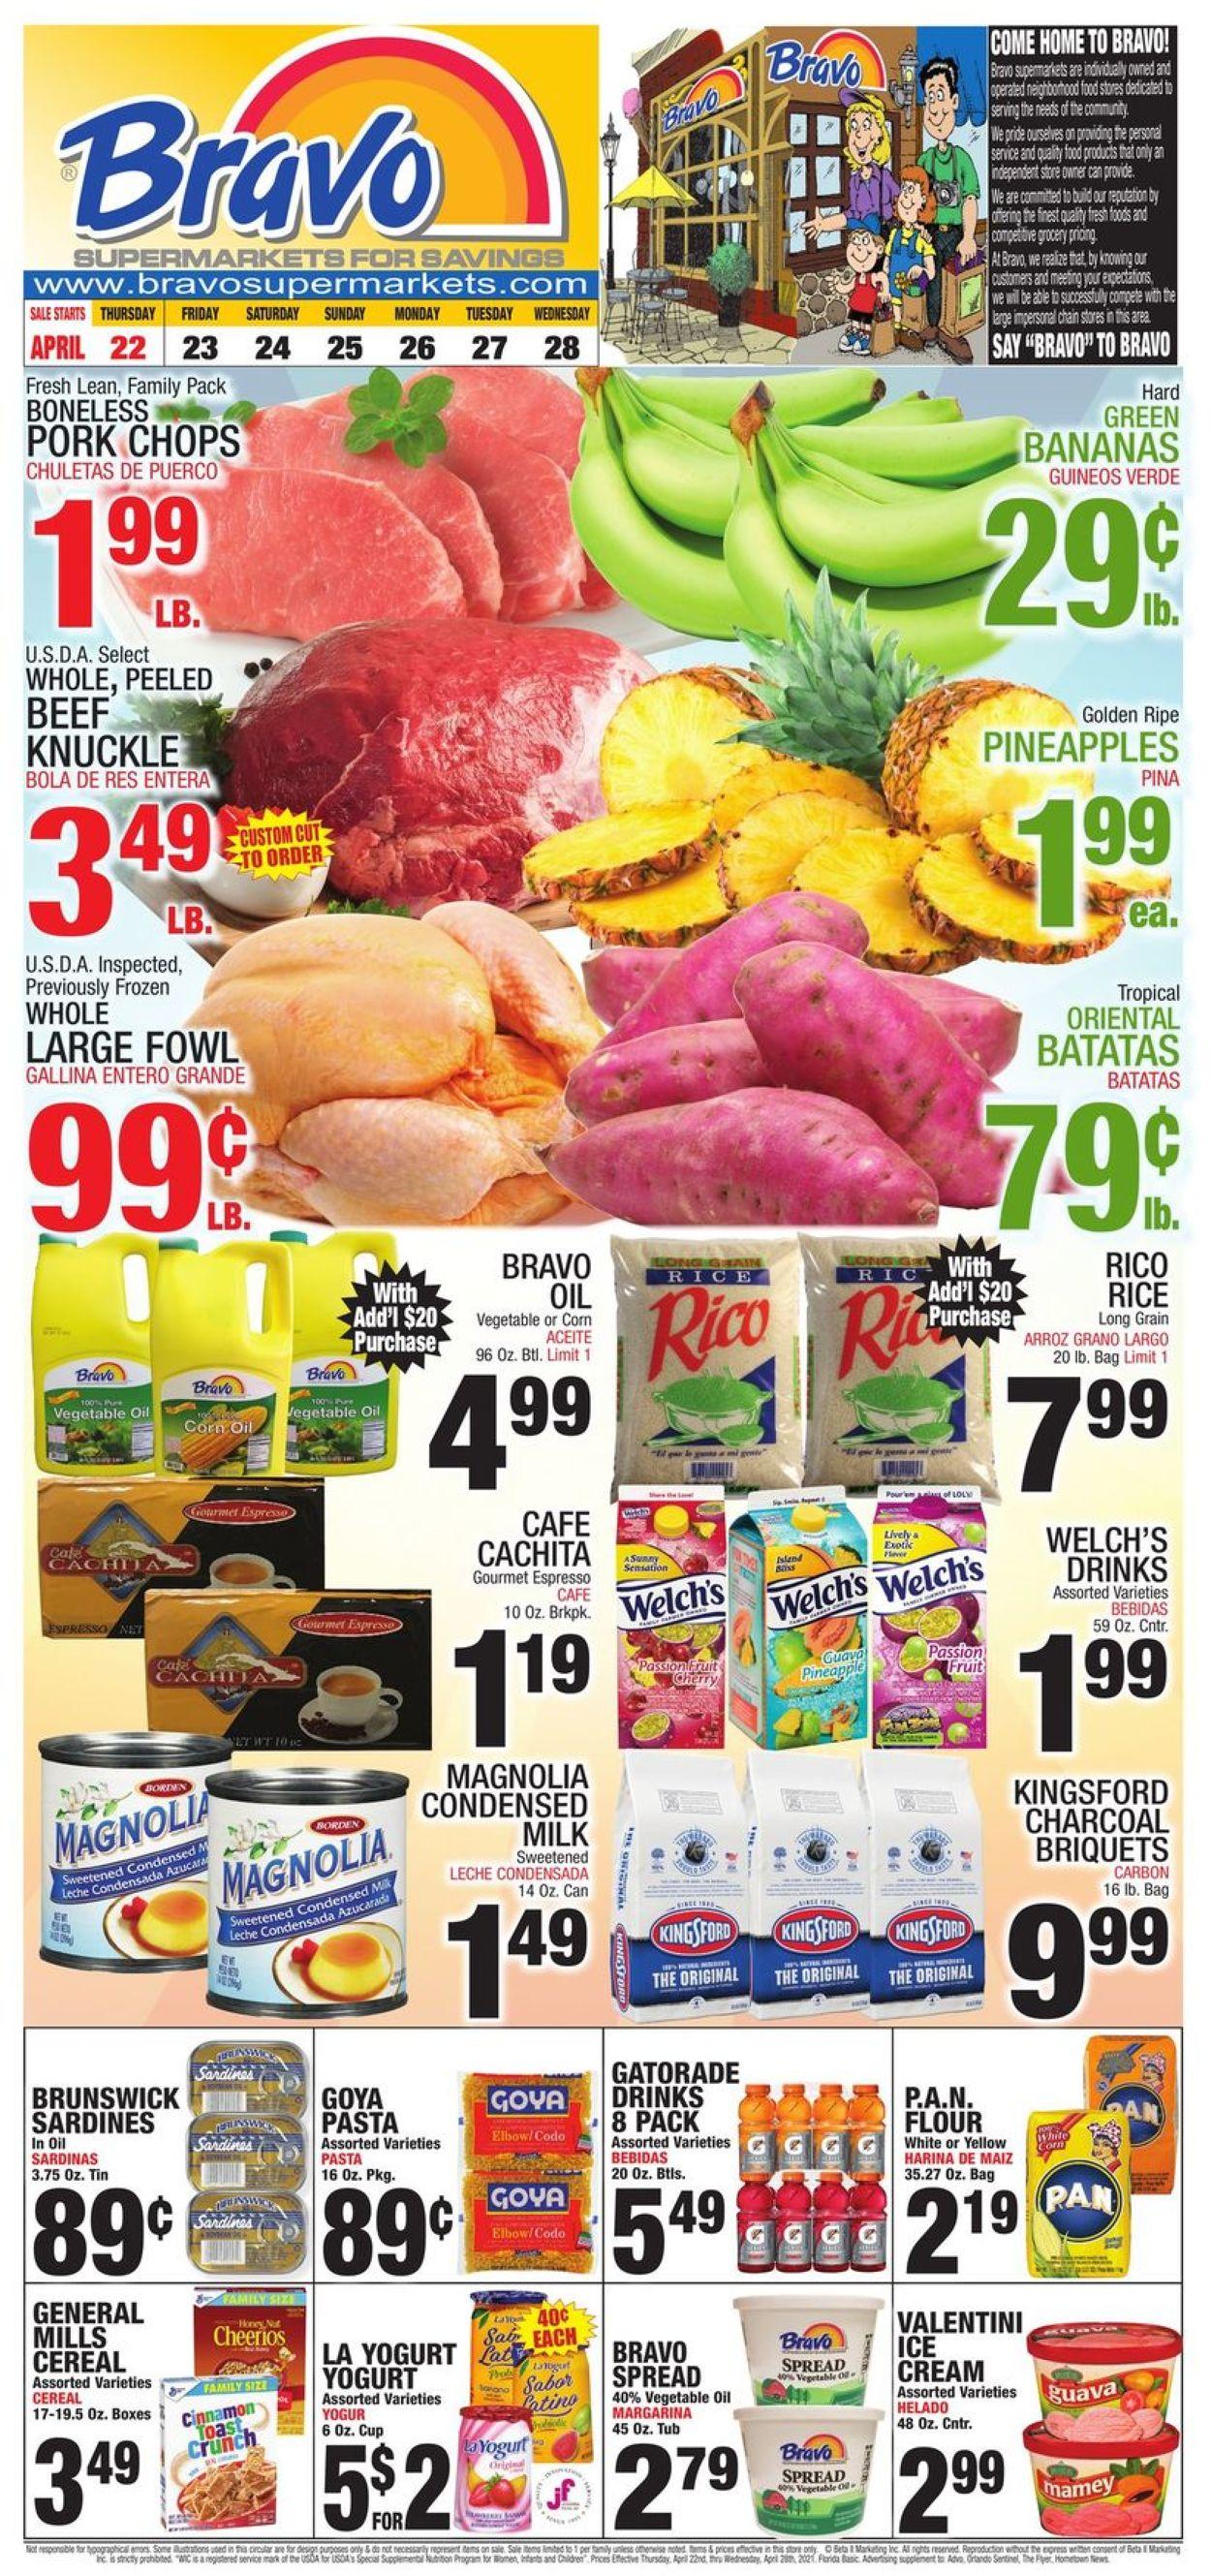 Bravo Supermarkets Weekly Ad Circular - valid 04/22-04/28/2021